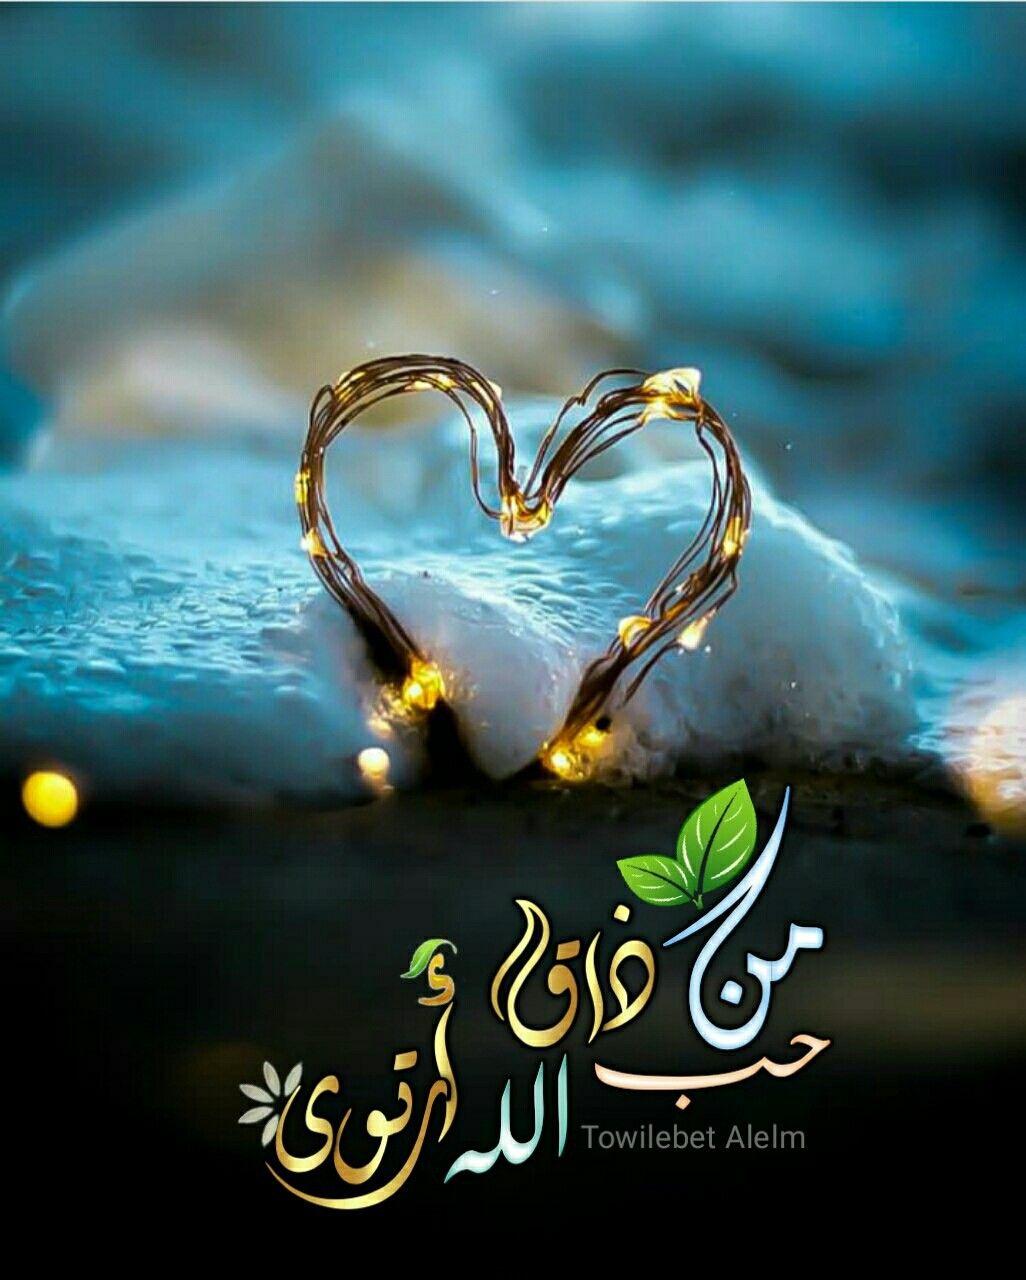 من ذاق حب الله ارتوى Islamic Pictures Islamic Images Islamic Quotes Wallpaper